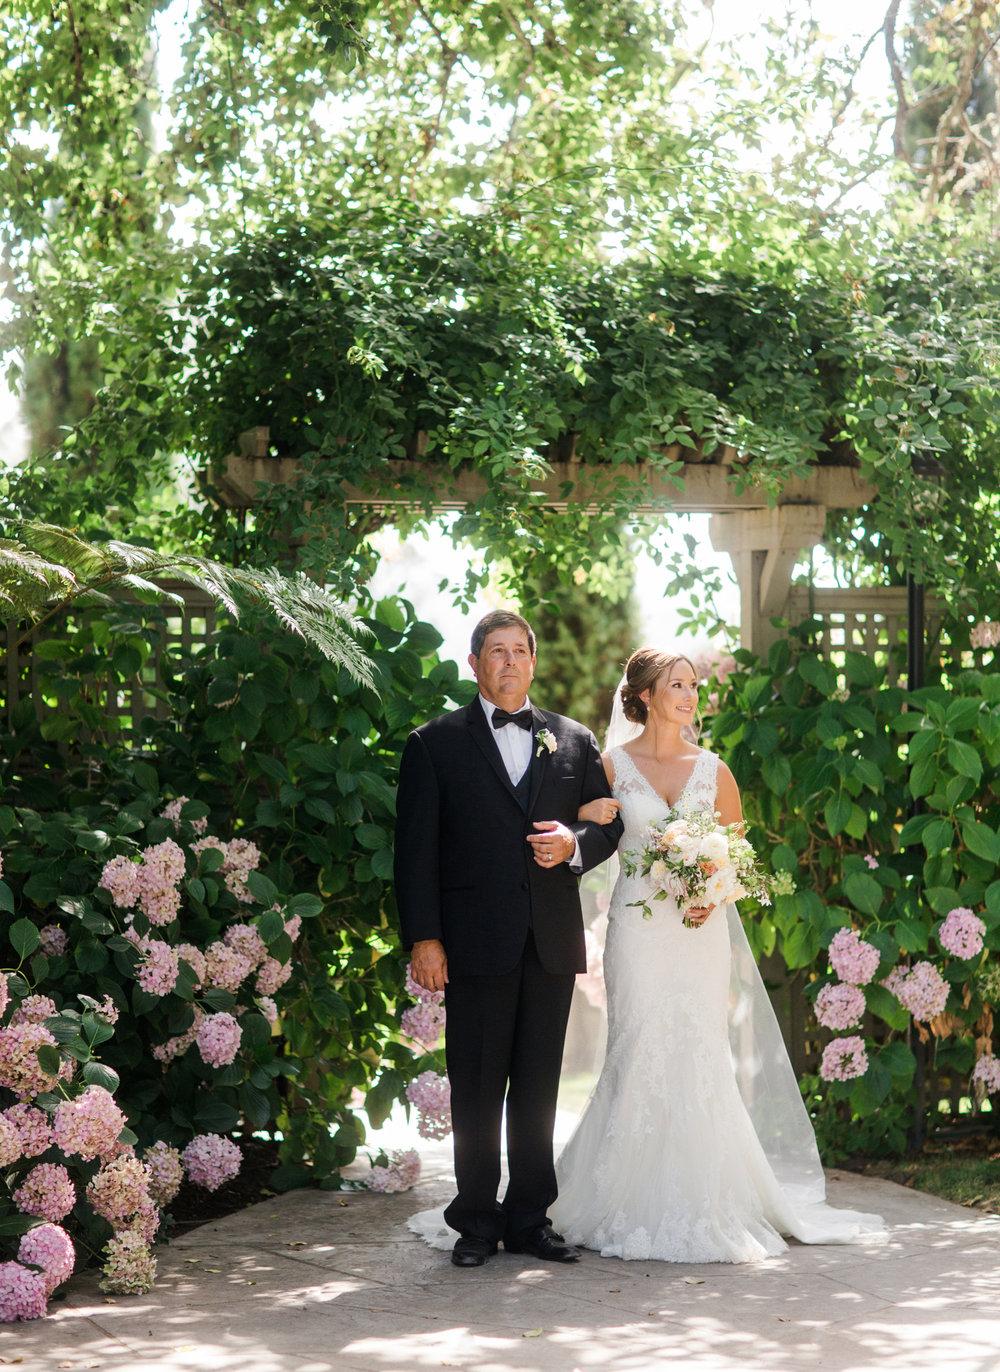 026_Vine_Hill_House_Wedding_Photographer.JPG